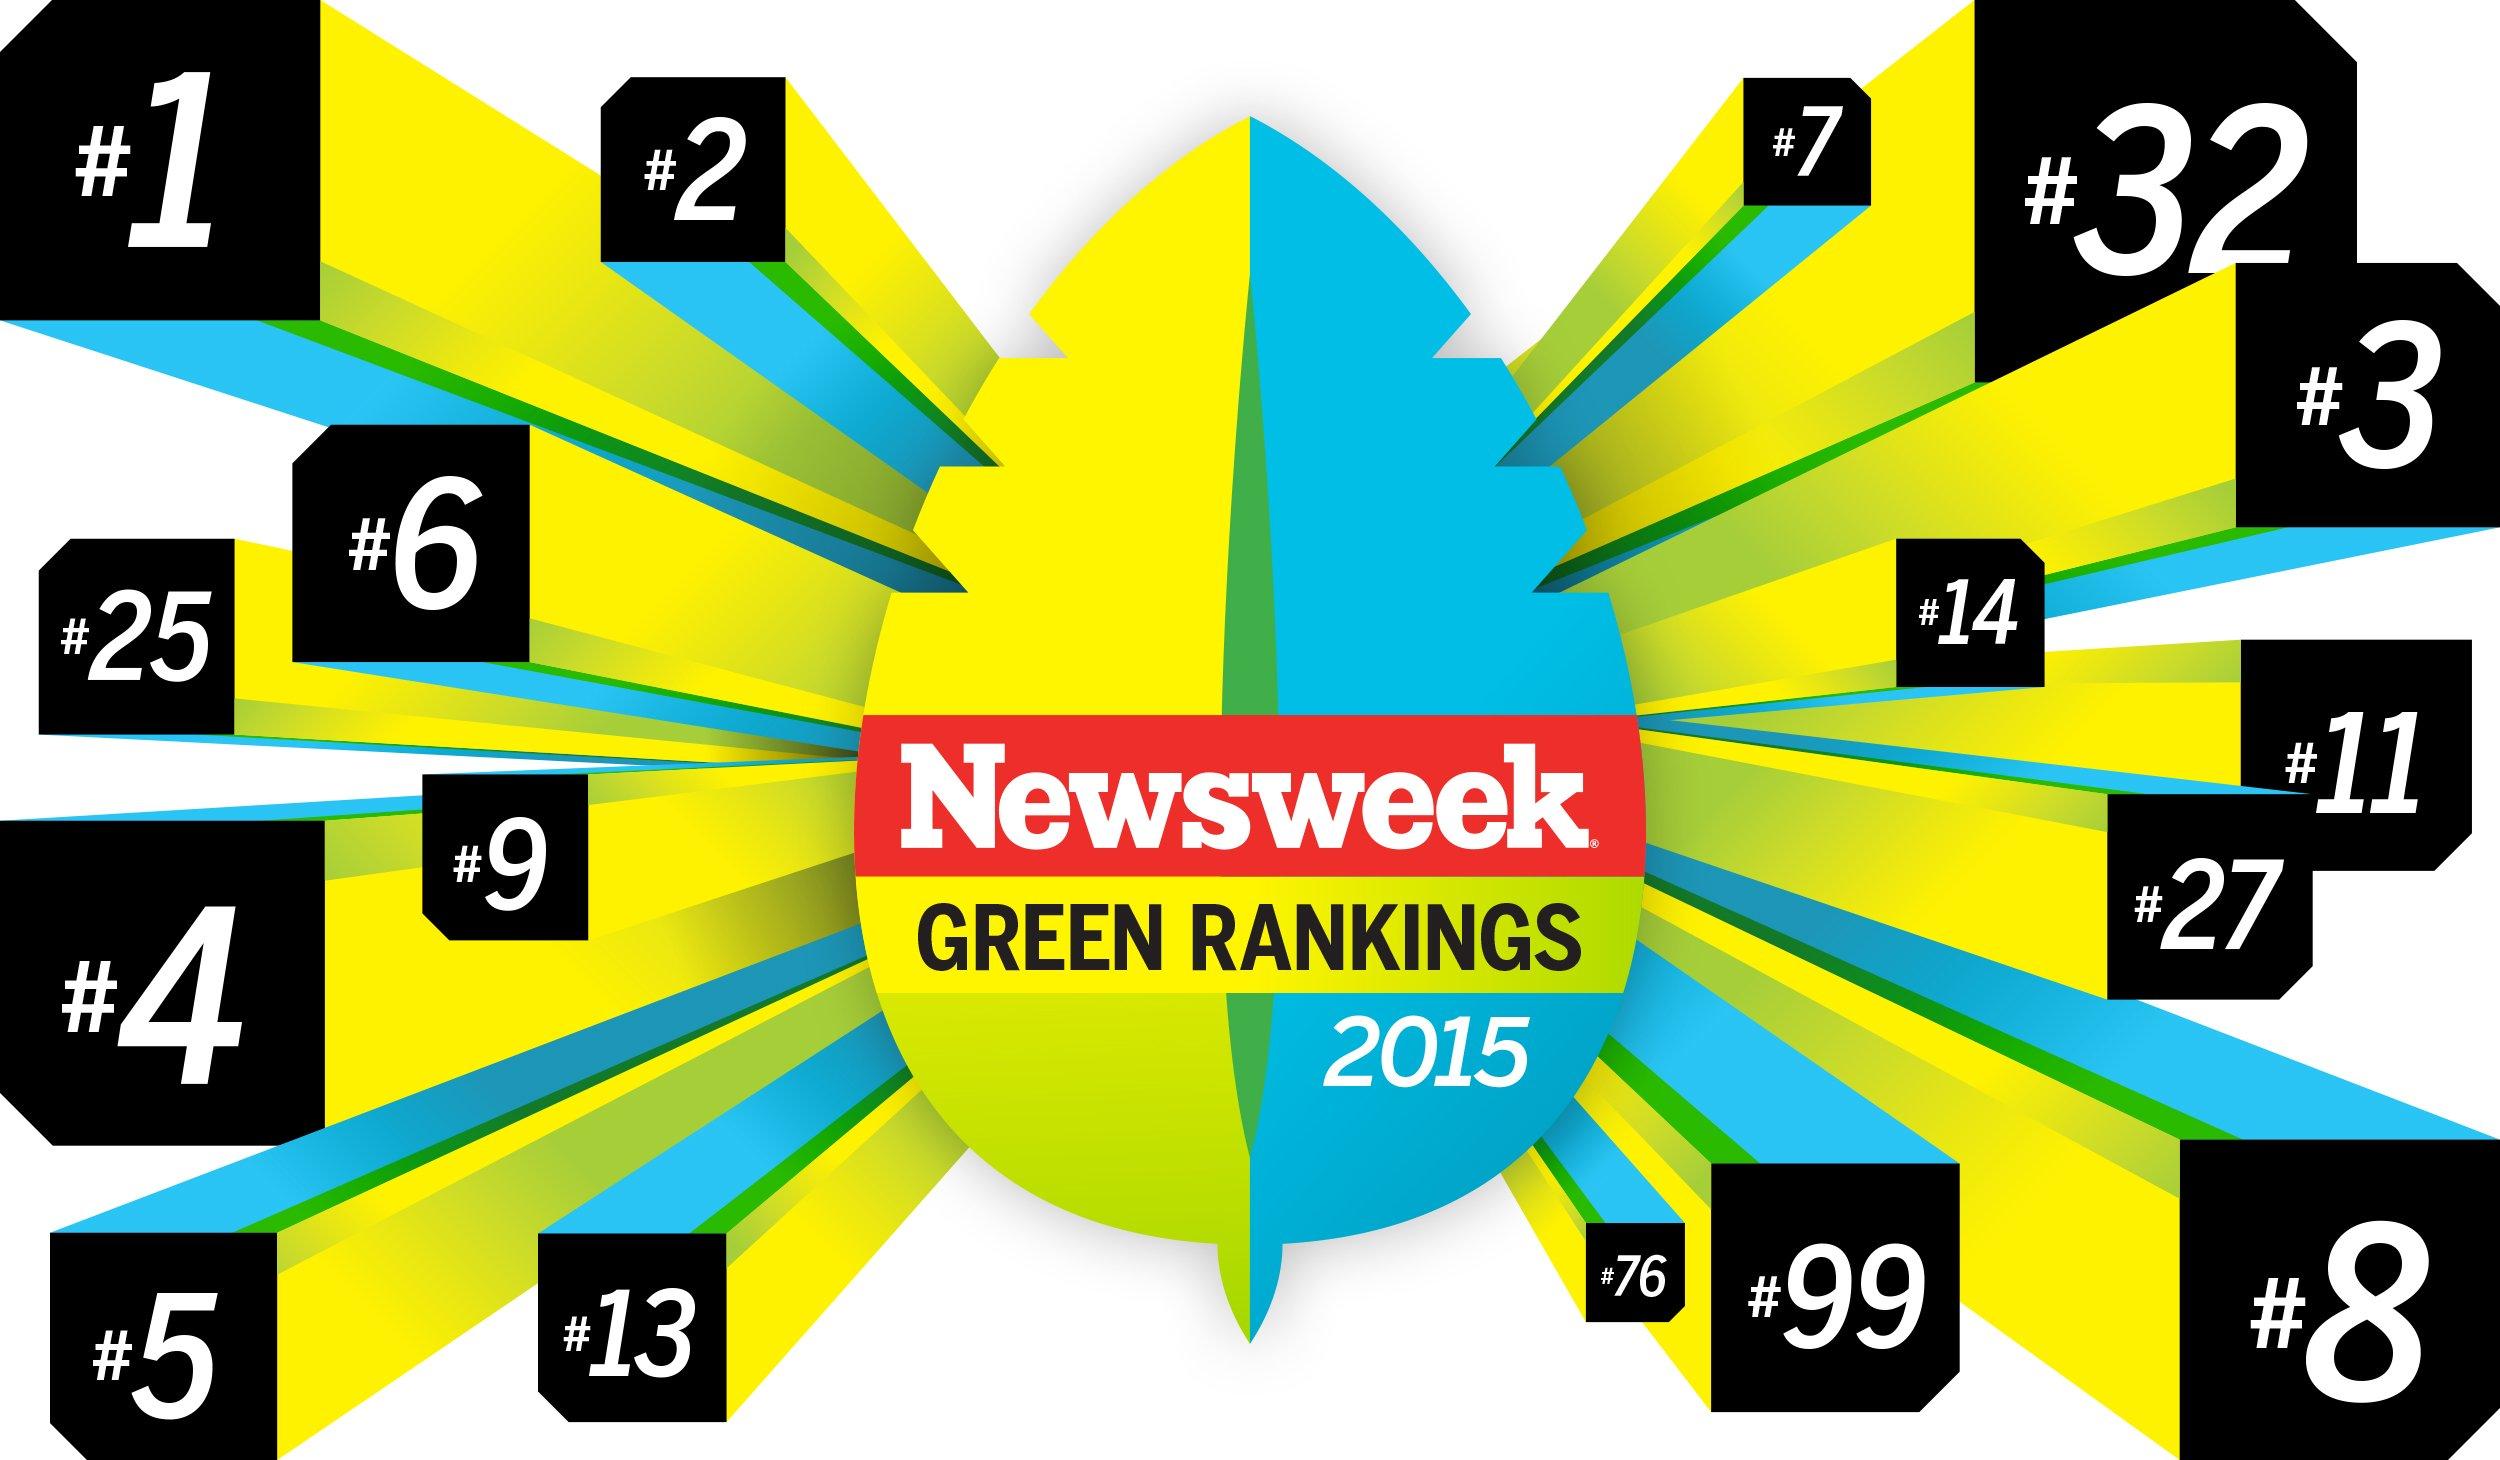 Newsweek Green Rankings 2015